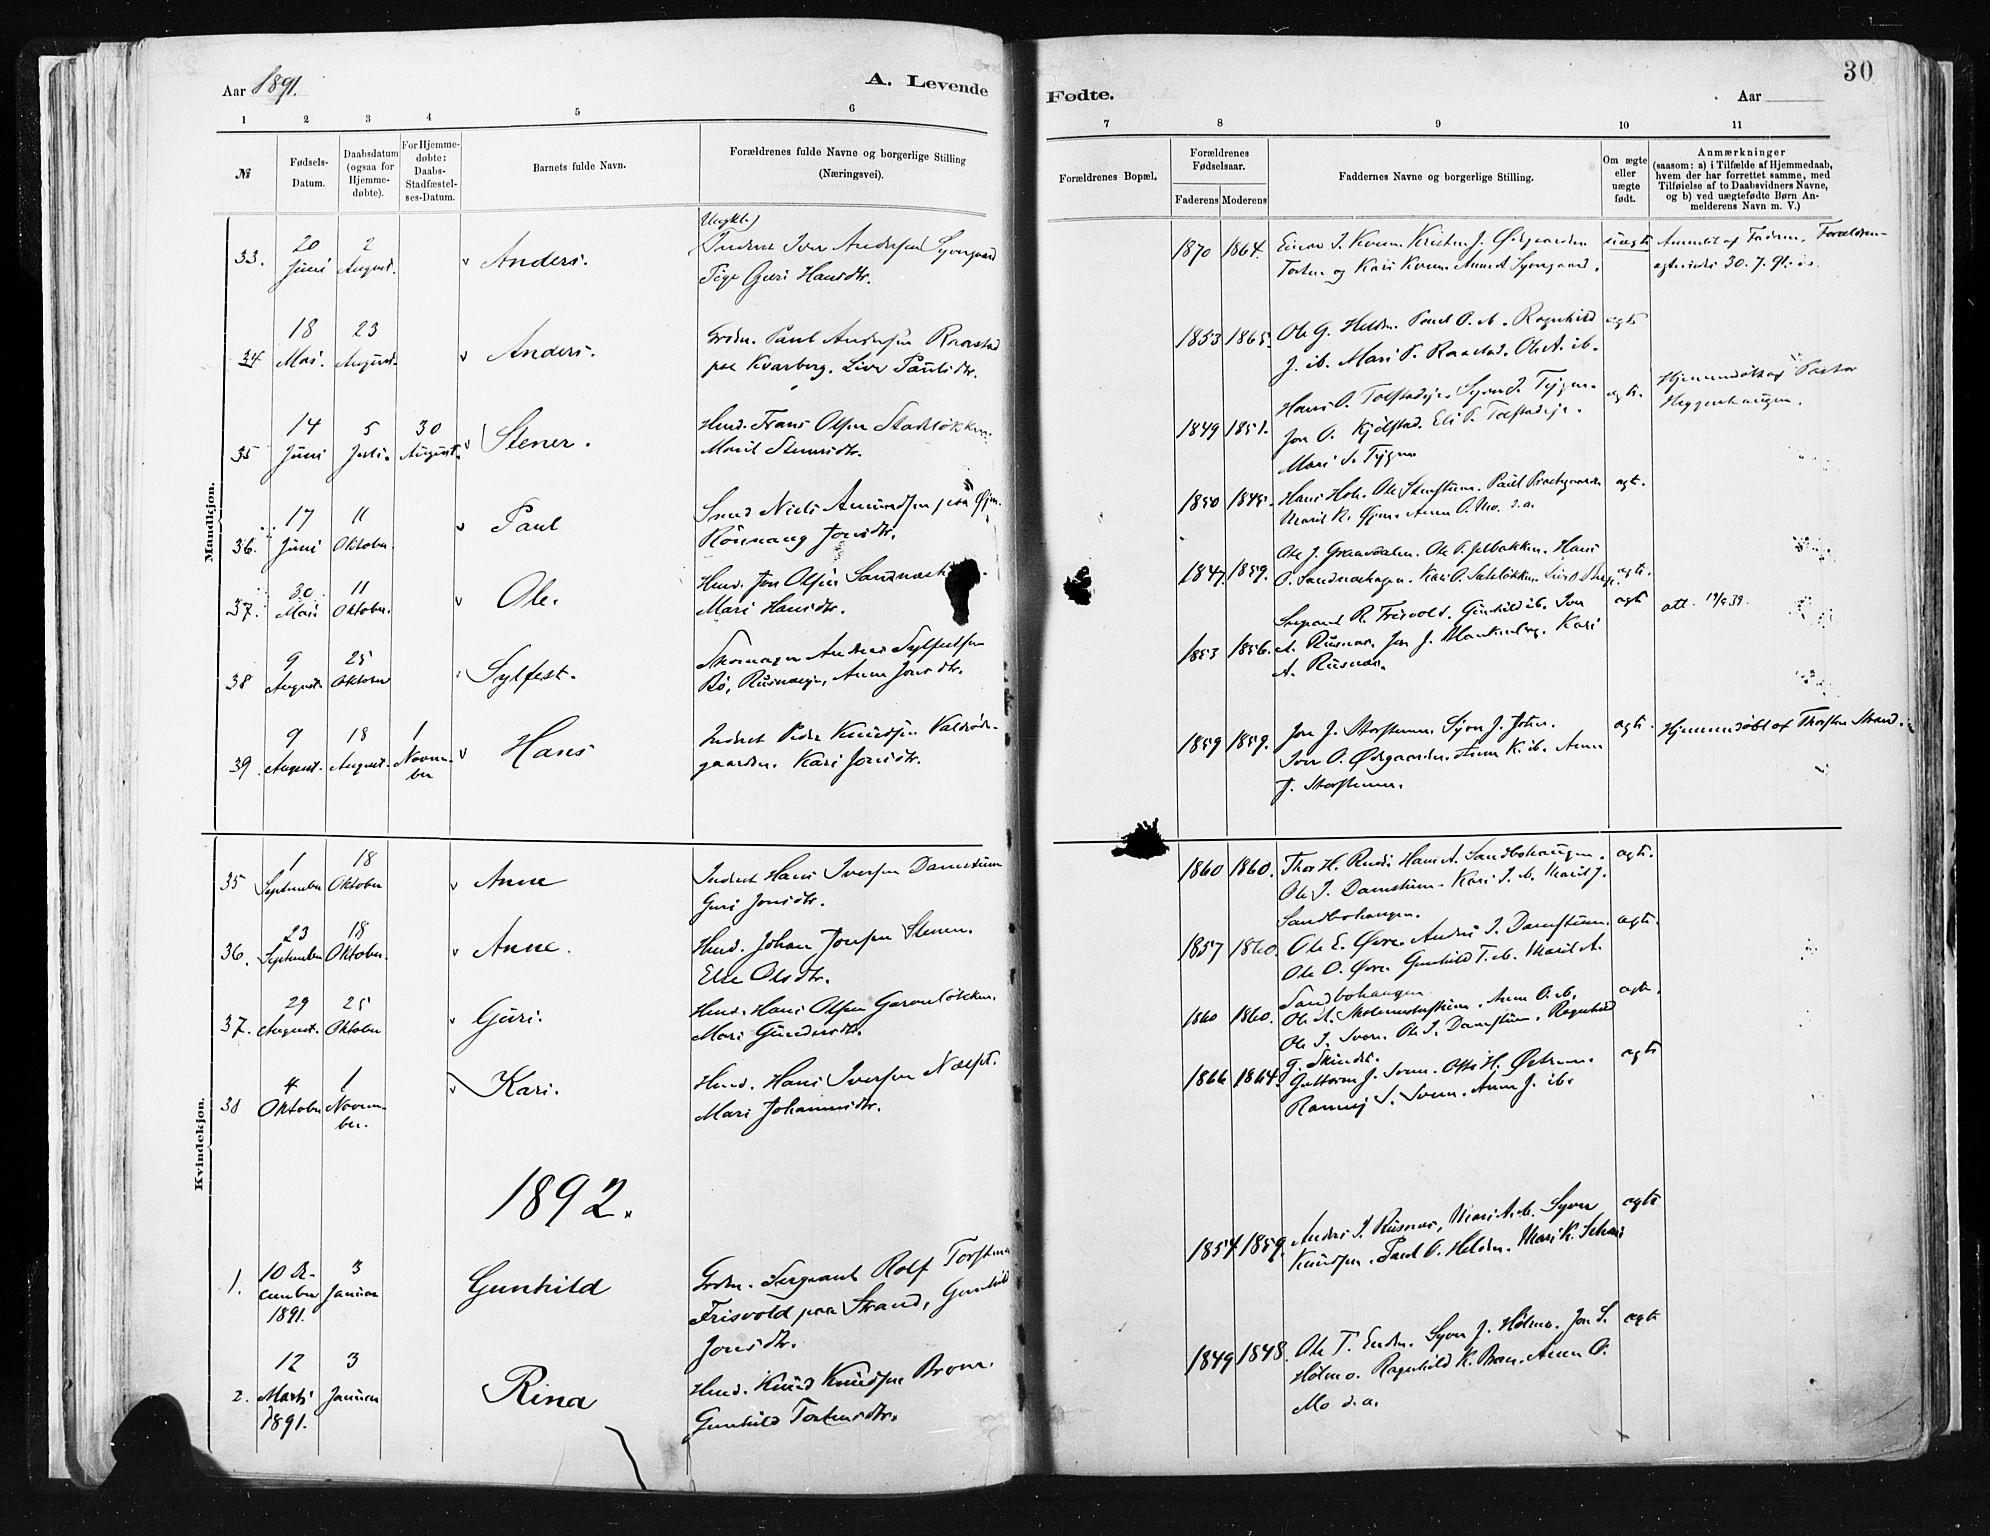 SAH, Vågå prestekontor, Ministerialbok nr. 9, 1886-1904, s. 30